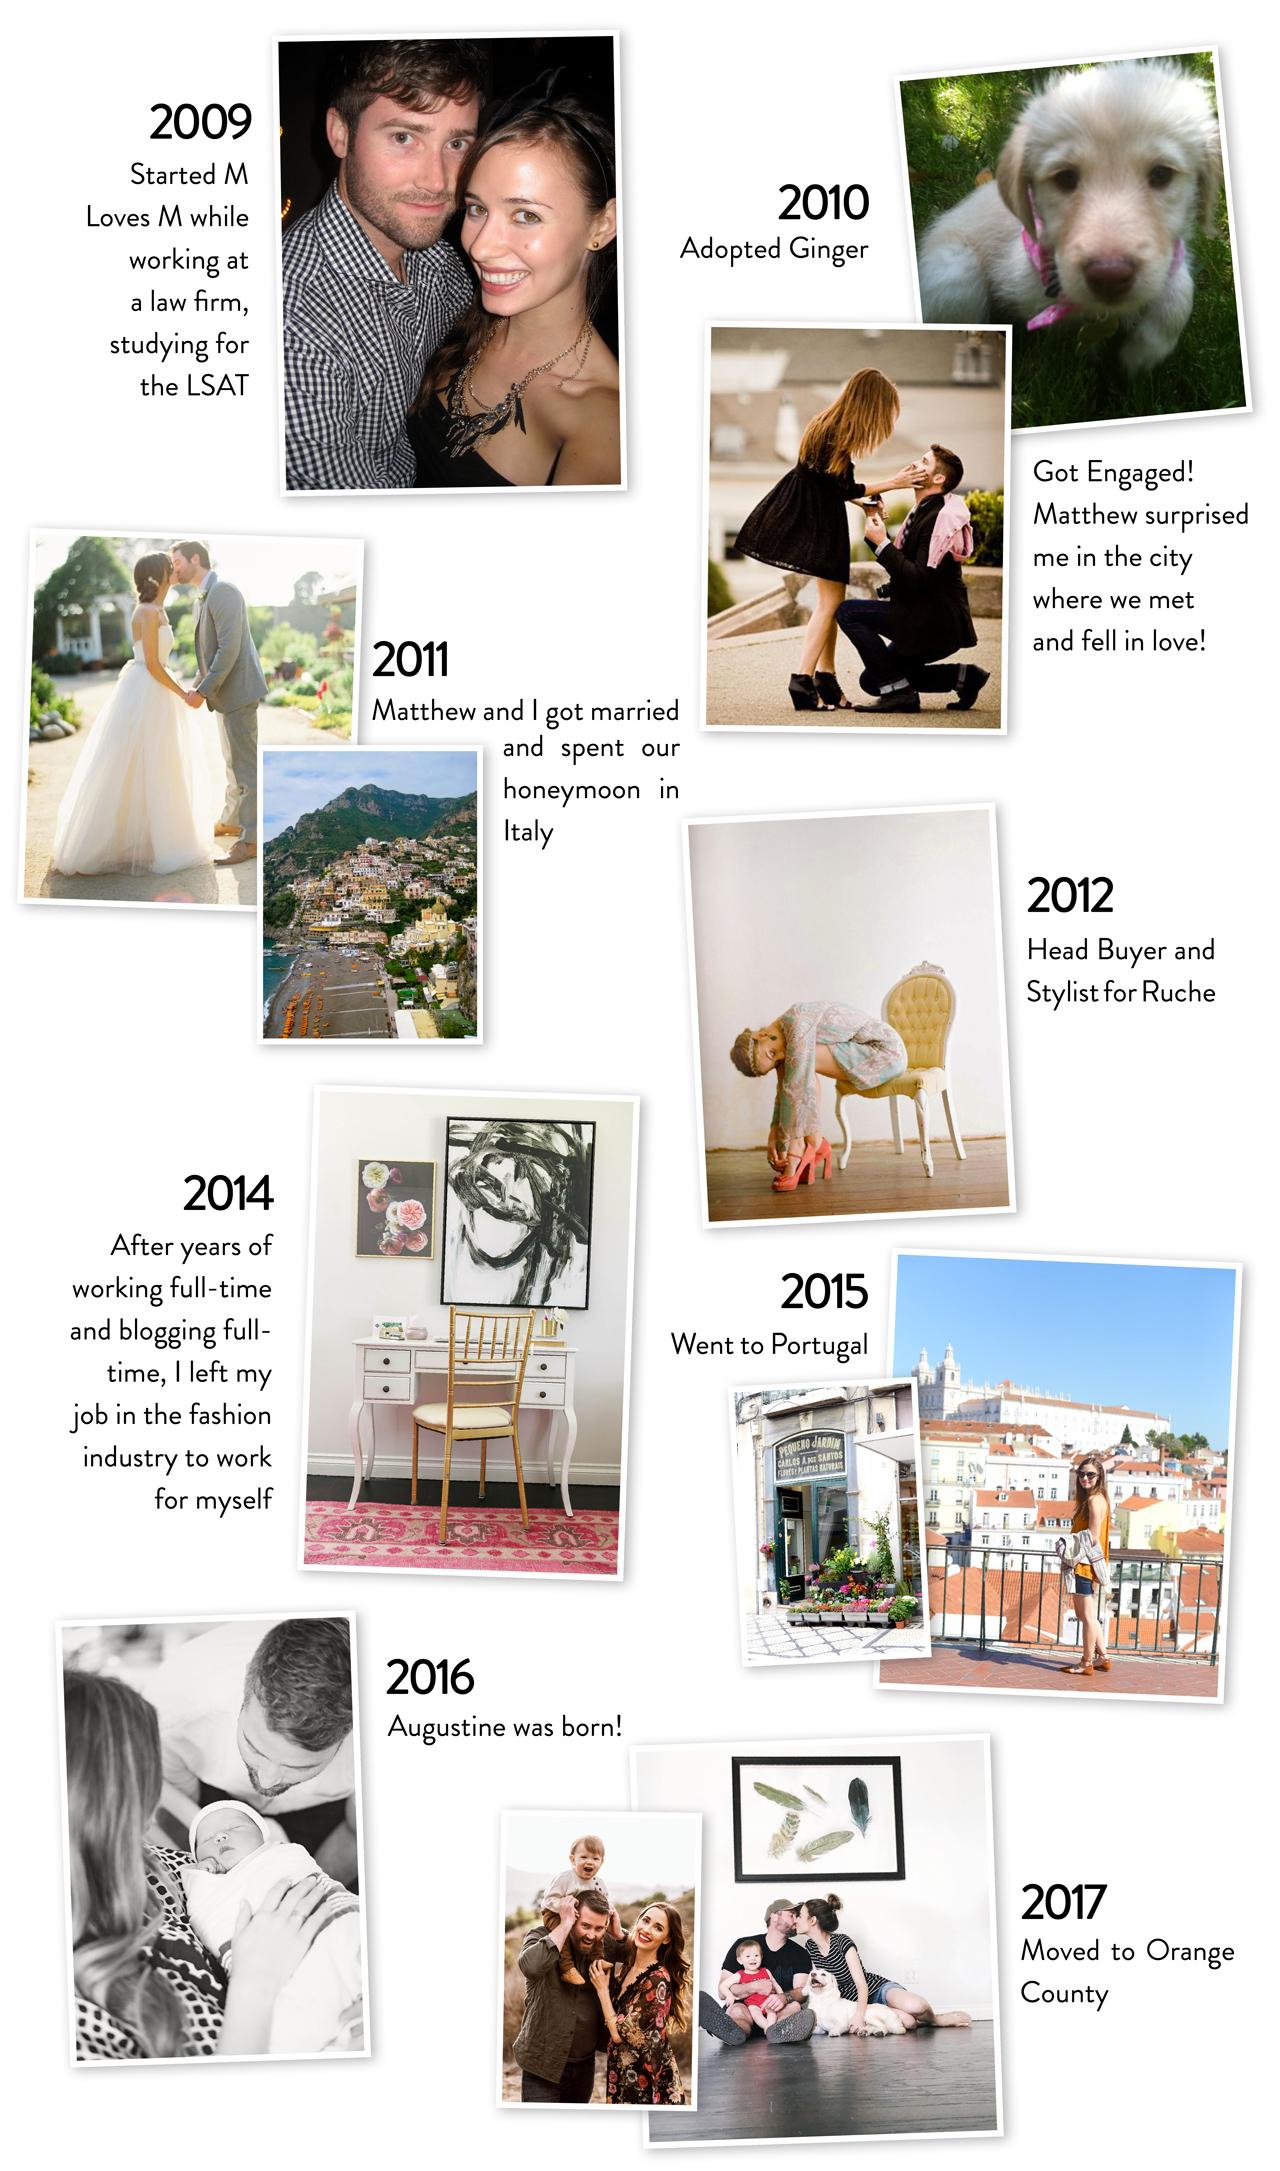 About Mara Ferreira of M Loves M Blog - @marmar